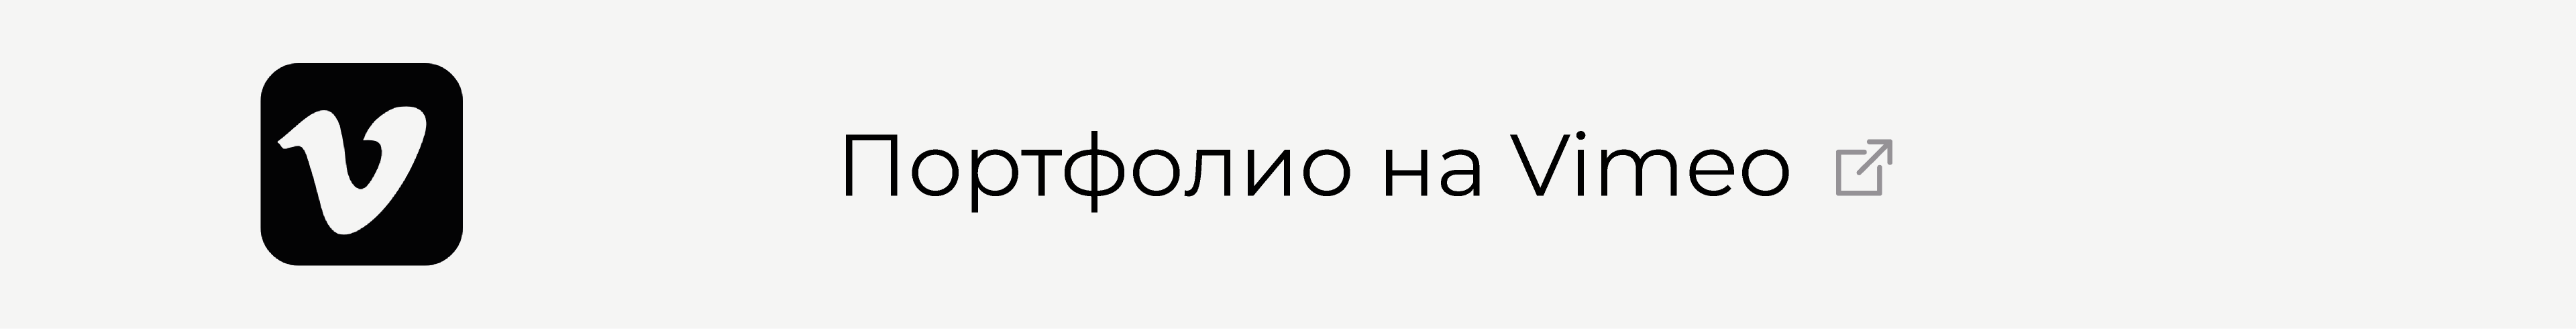 Портфолио на Vimeo: https://vimeo.com/aleksvi